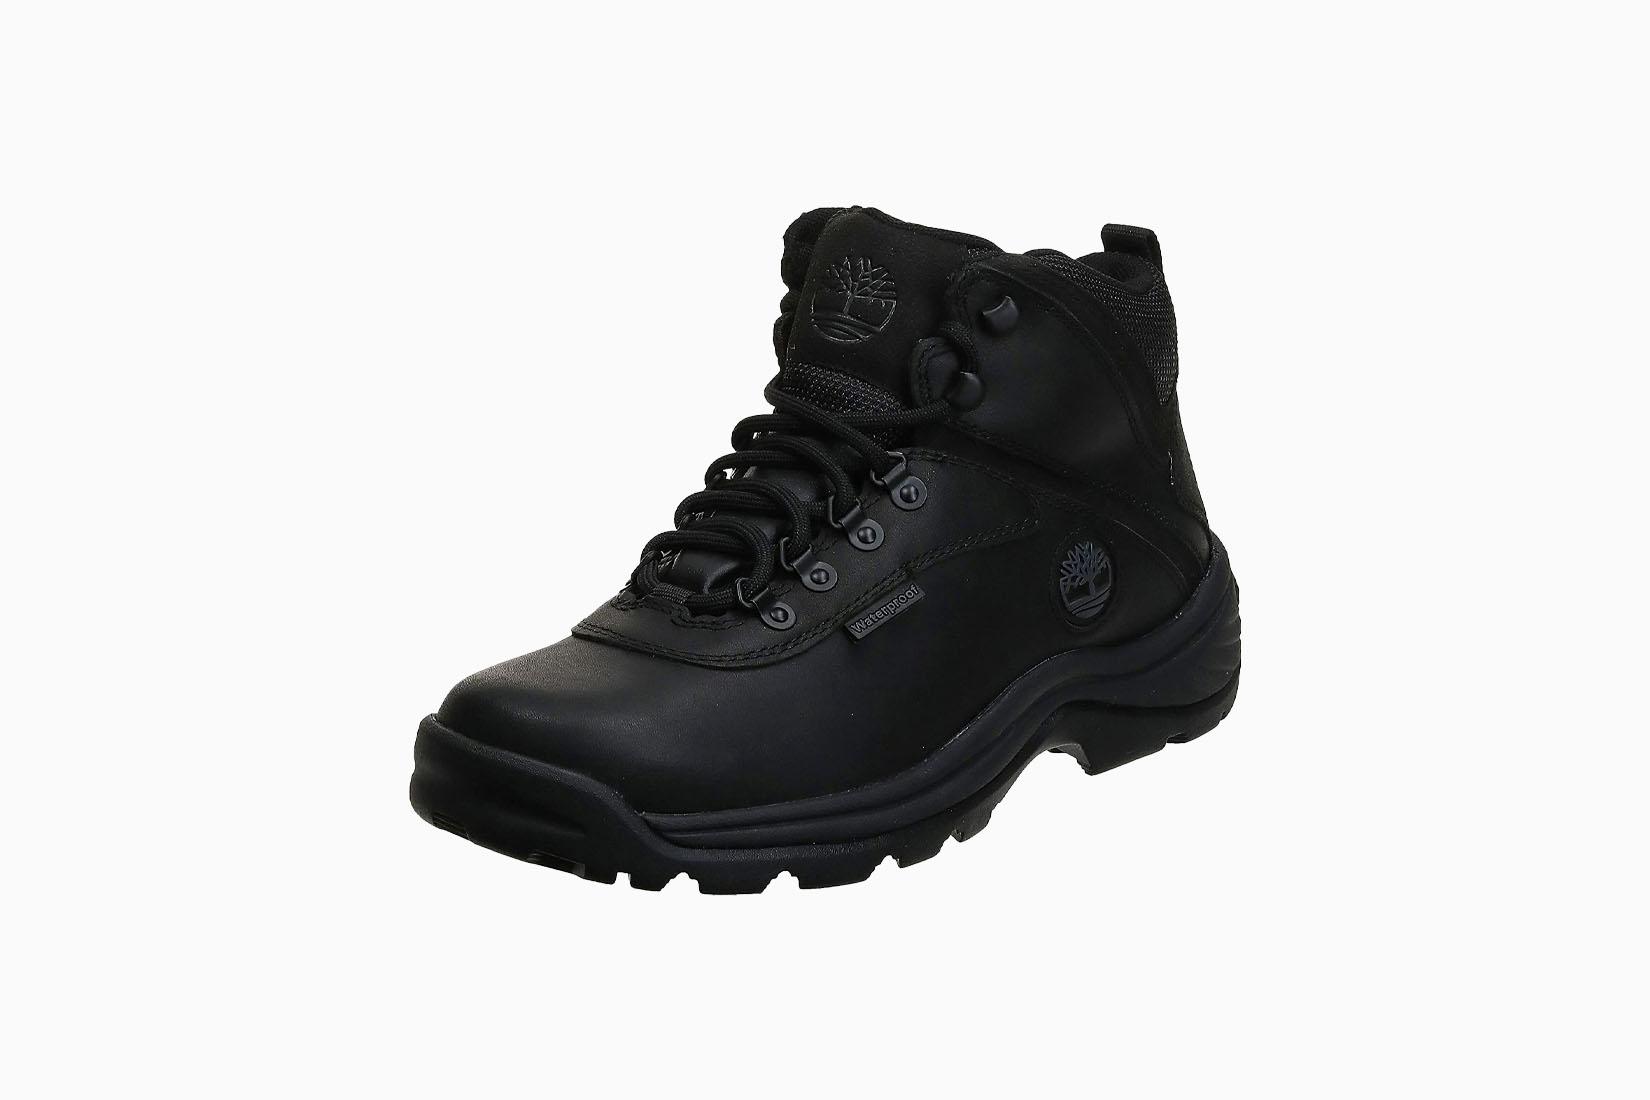 best waterproof shoes men timberland review Luxe Digital